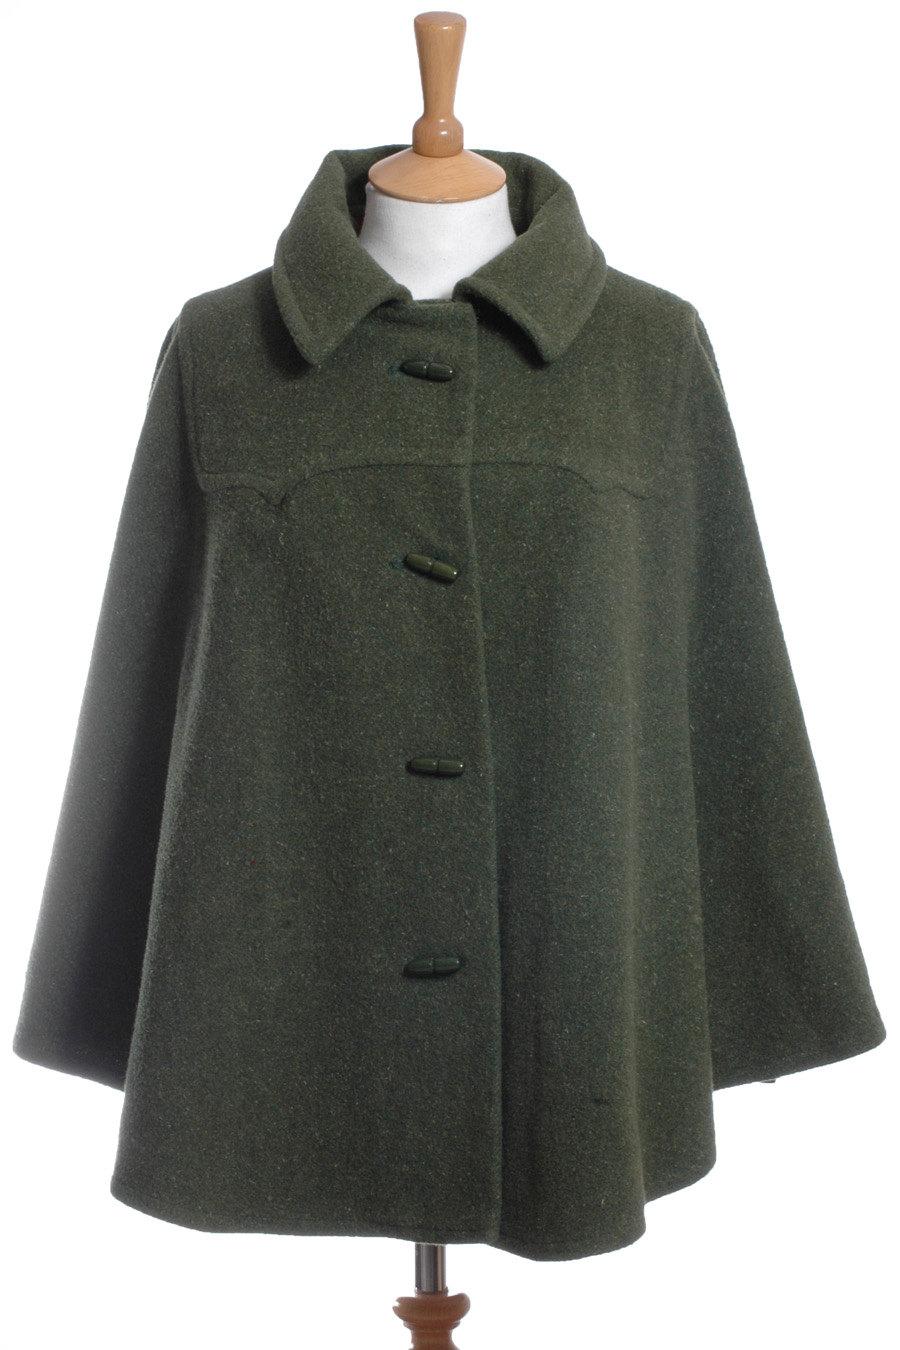 1970s wool cape